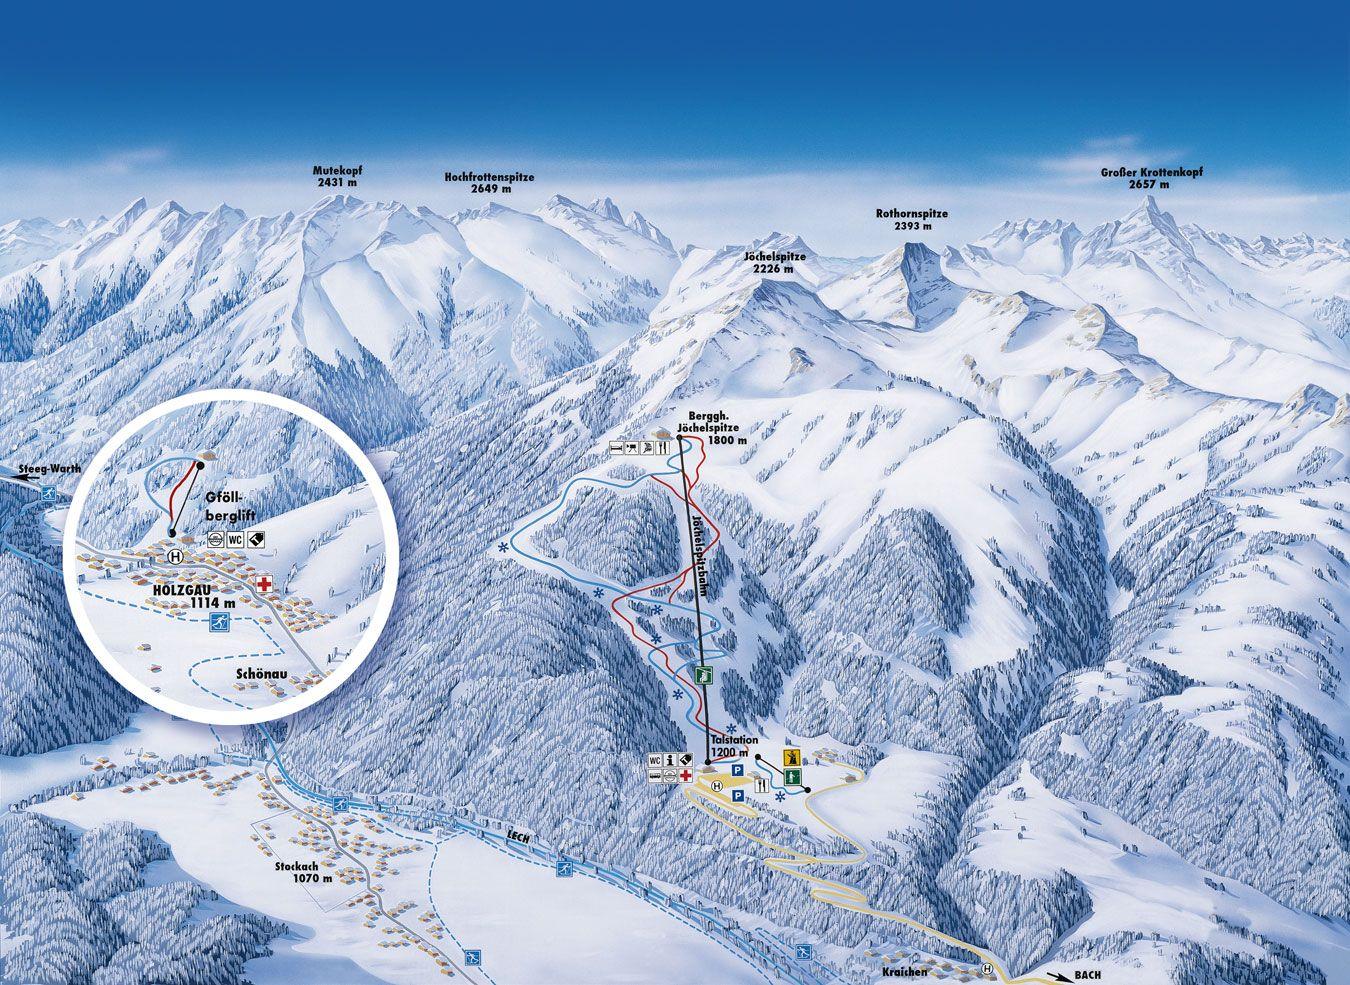 Lechtaler Bergbahn - Joechelspitze Bach-Stockach